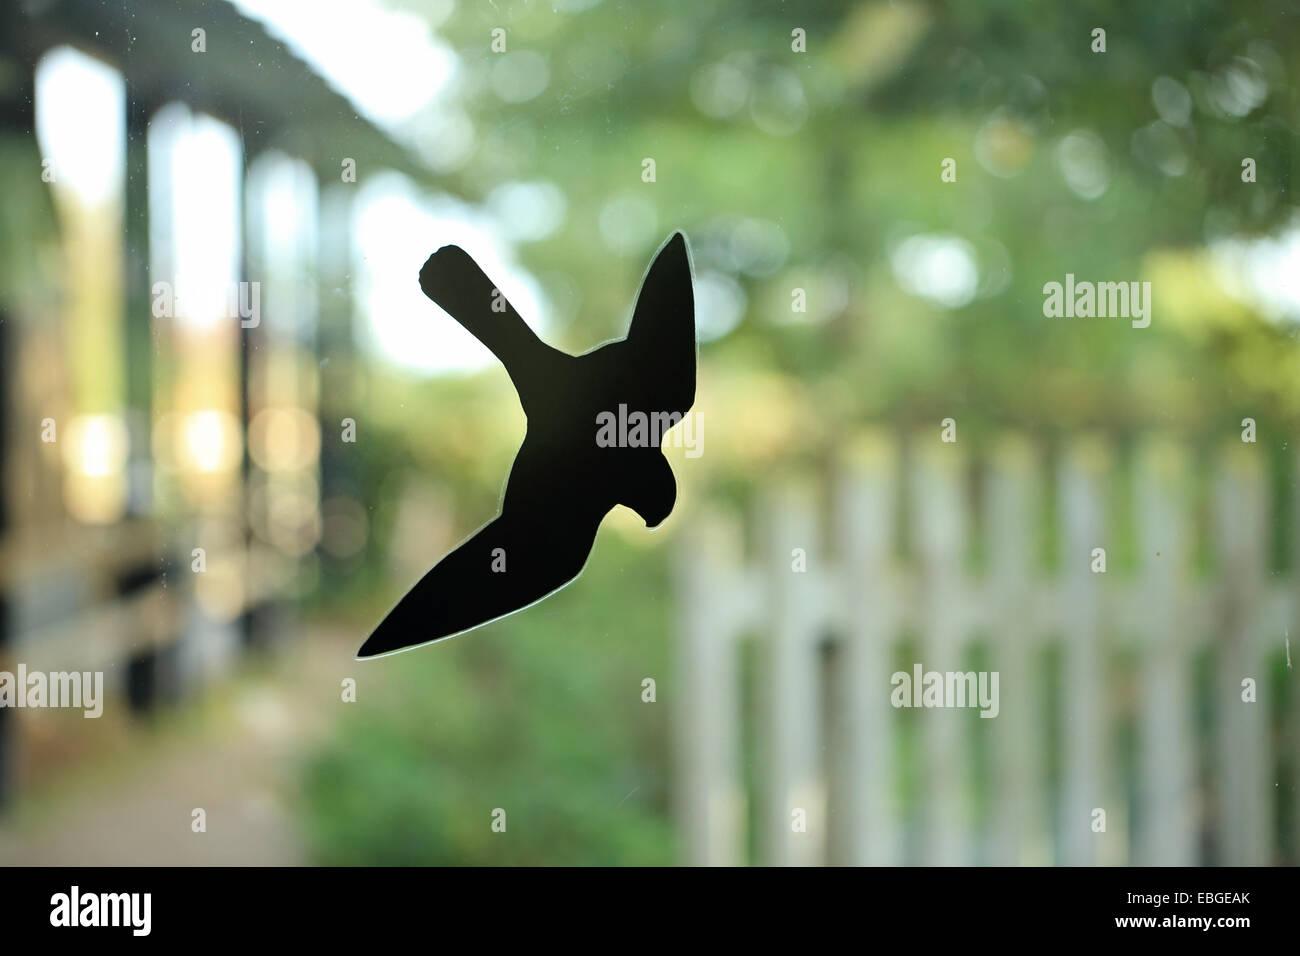 Bird strike deterrent Falcon (Falco) on window - Stock Image